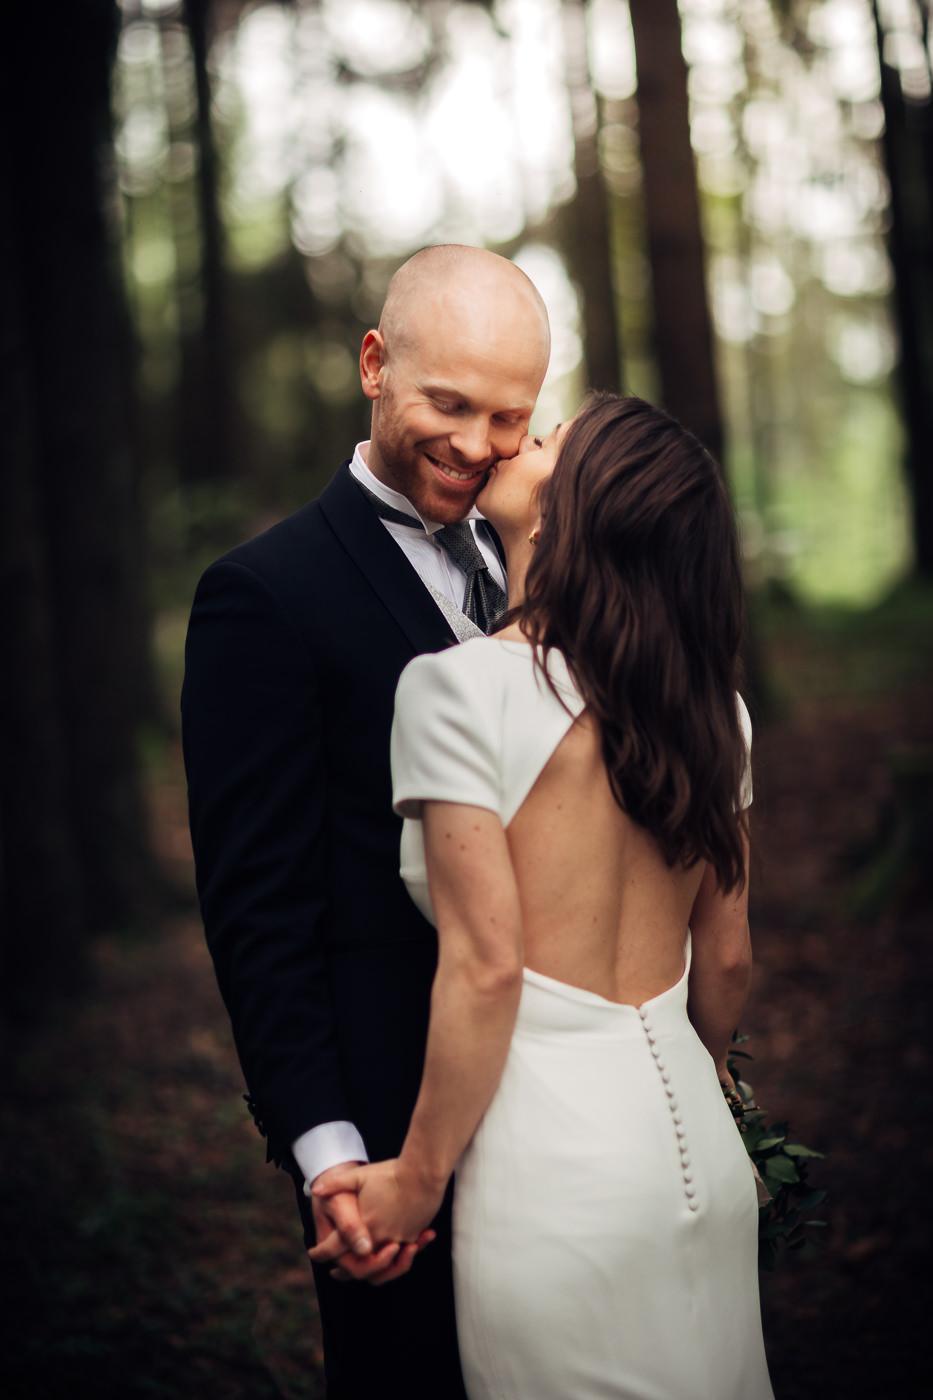 Malene & Ole Martin - elegant dansk- norskt bryllup i Oslo Bryllup Gamle Aker Oslo 32 Akershus